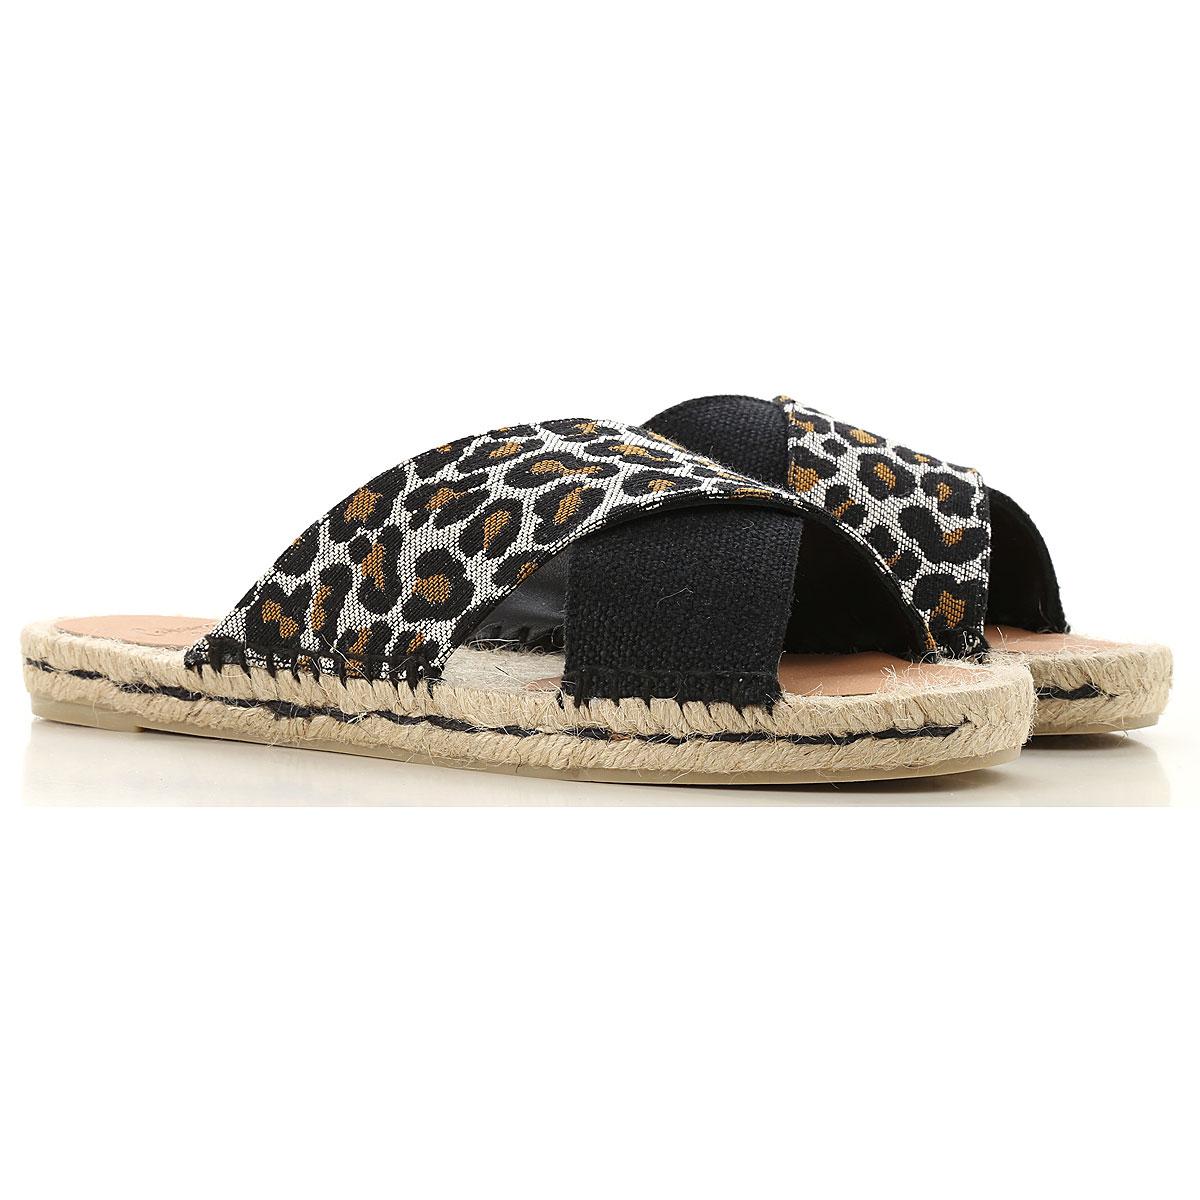 Castaner Sandals for Women On Sale in Outlet, Black, Canvas, 2019, 6